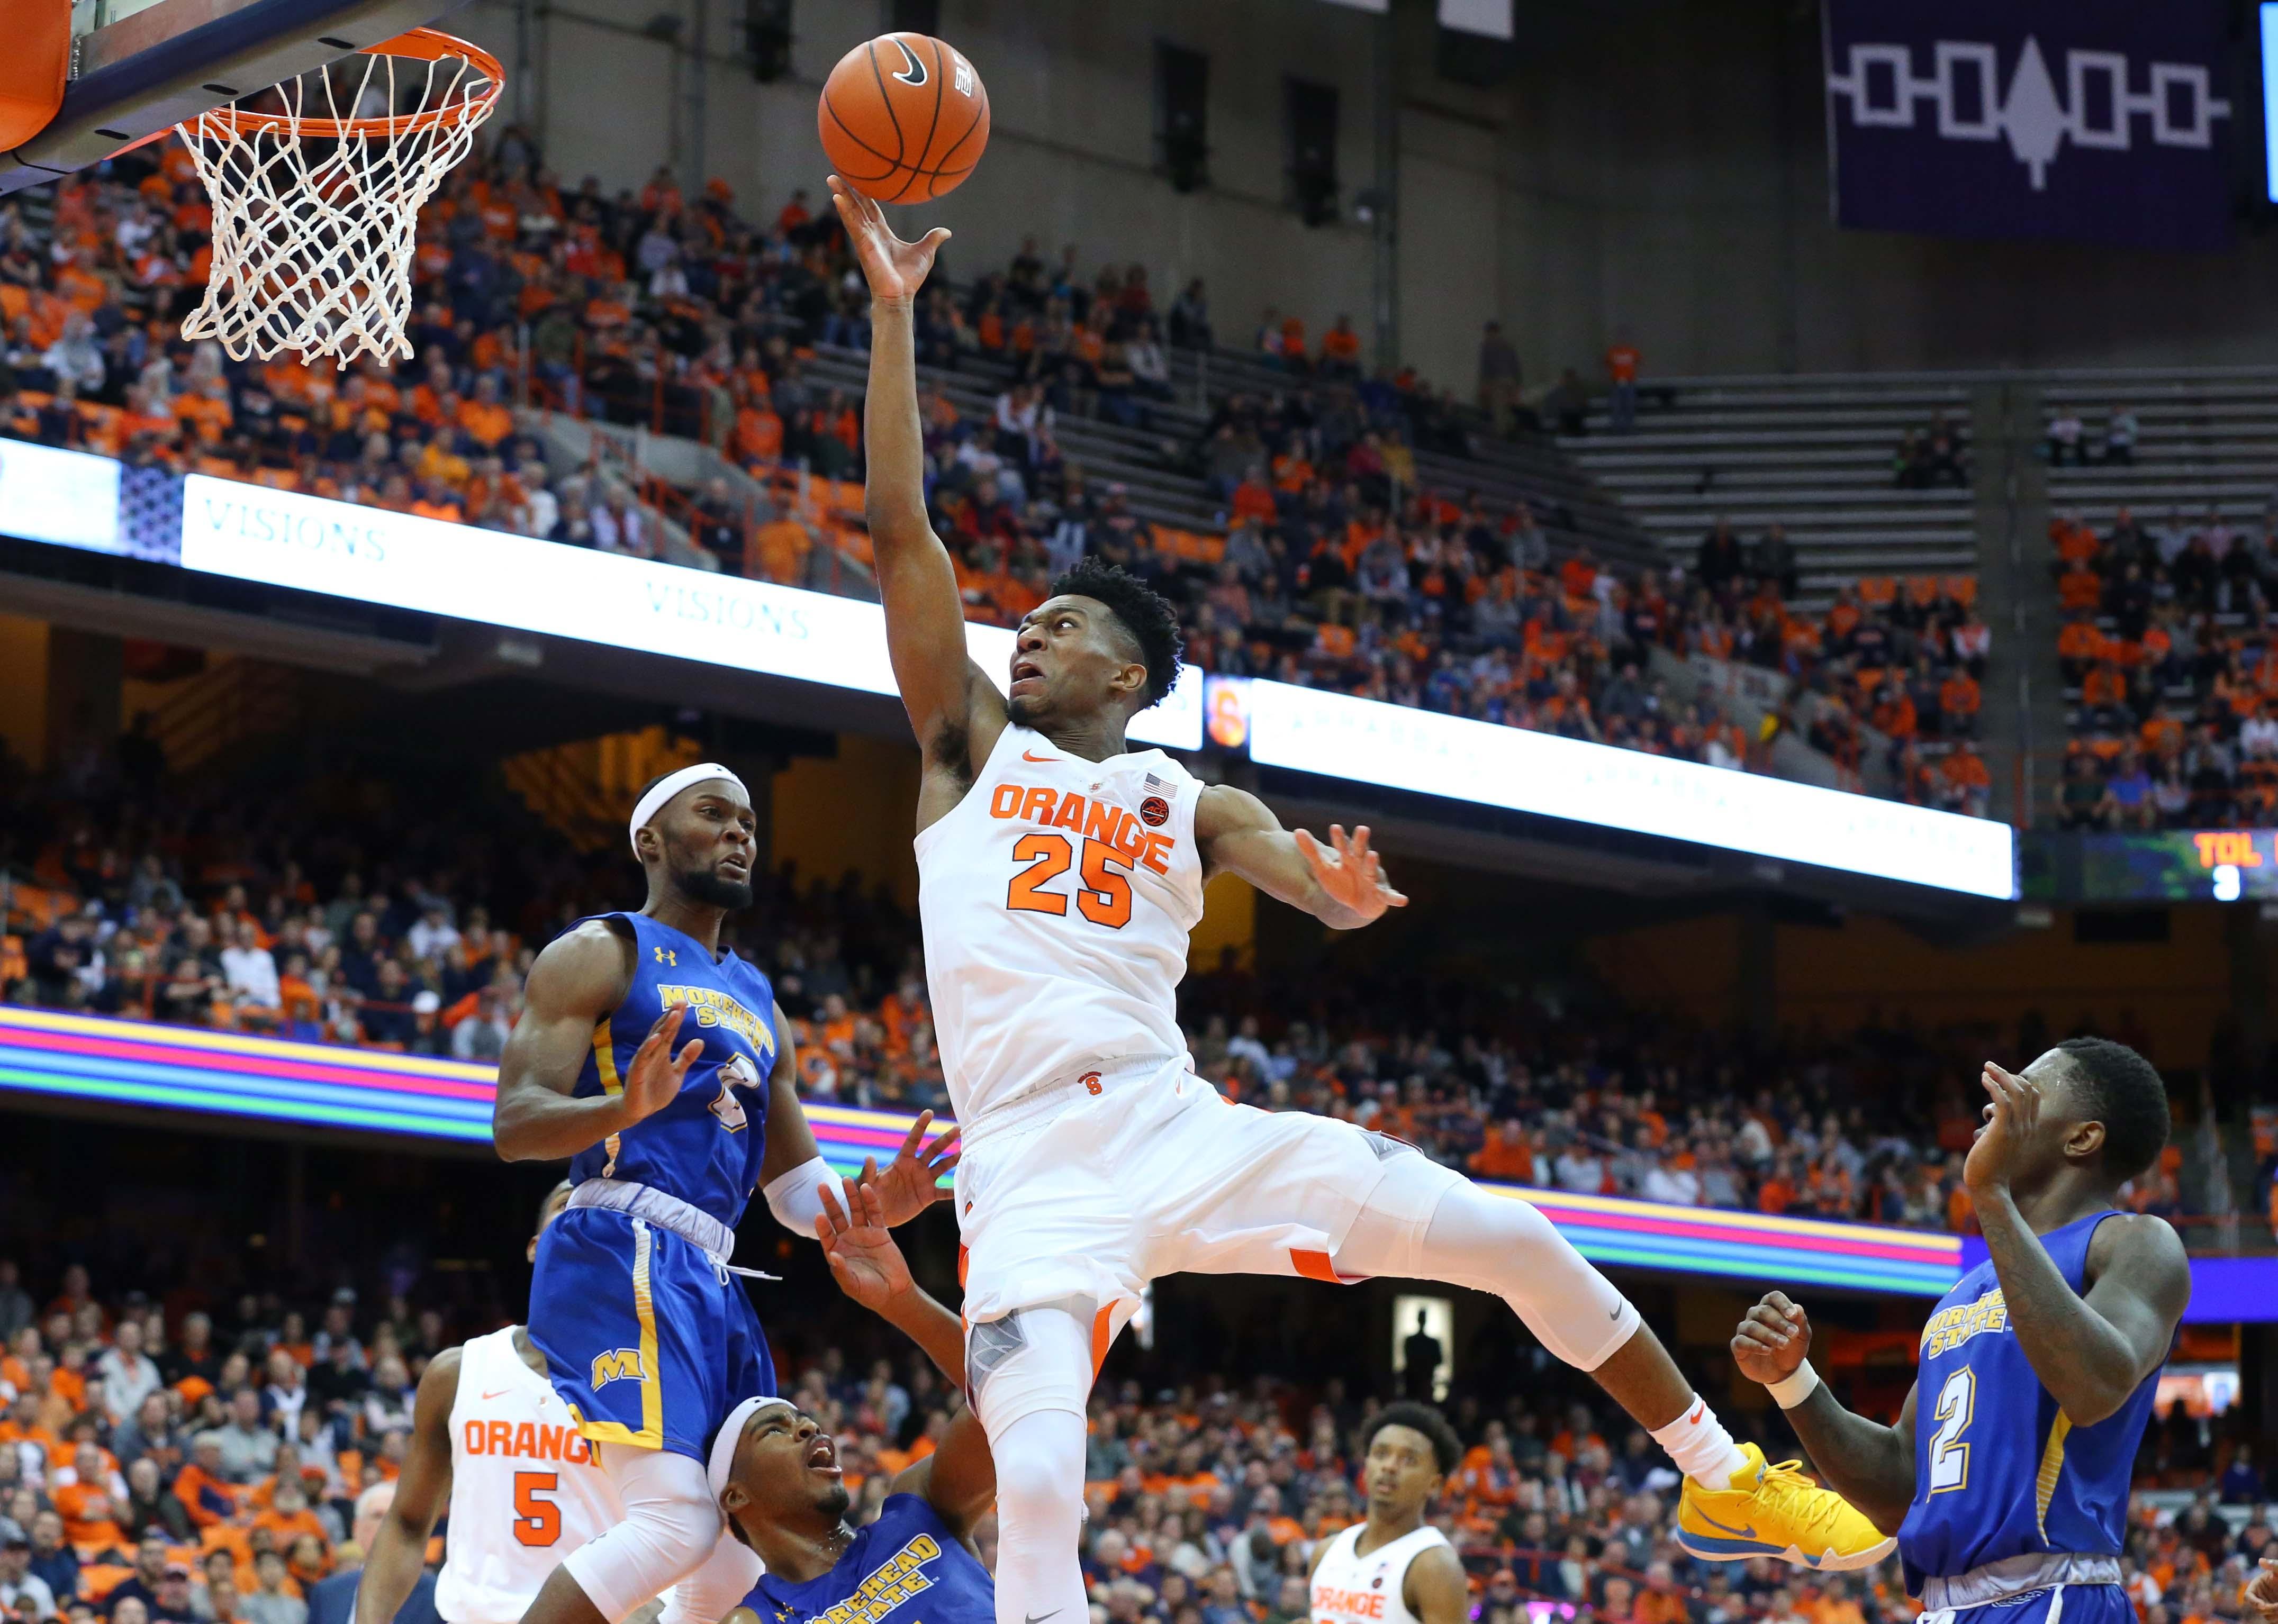 NCAA Basketball: Morehead State at Syracuse